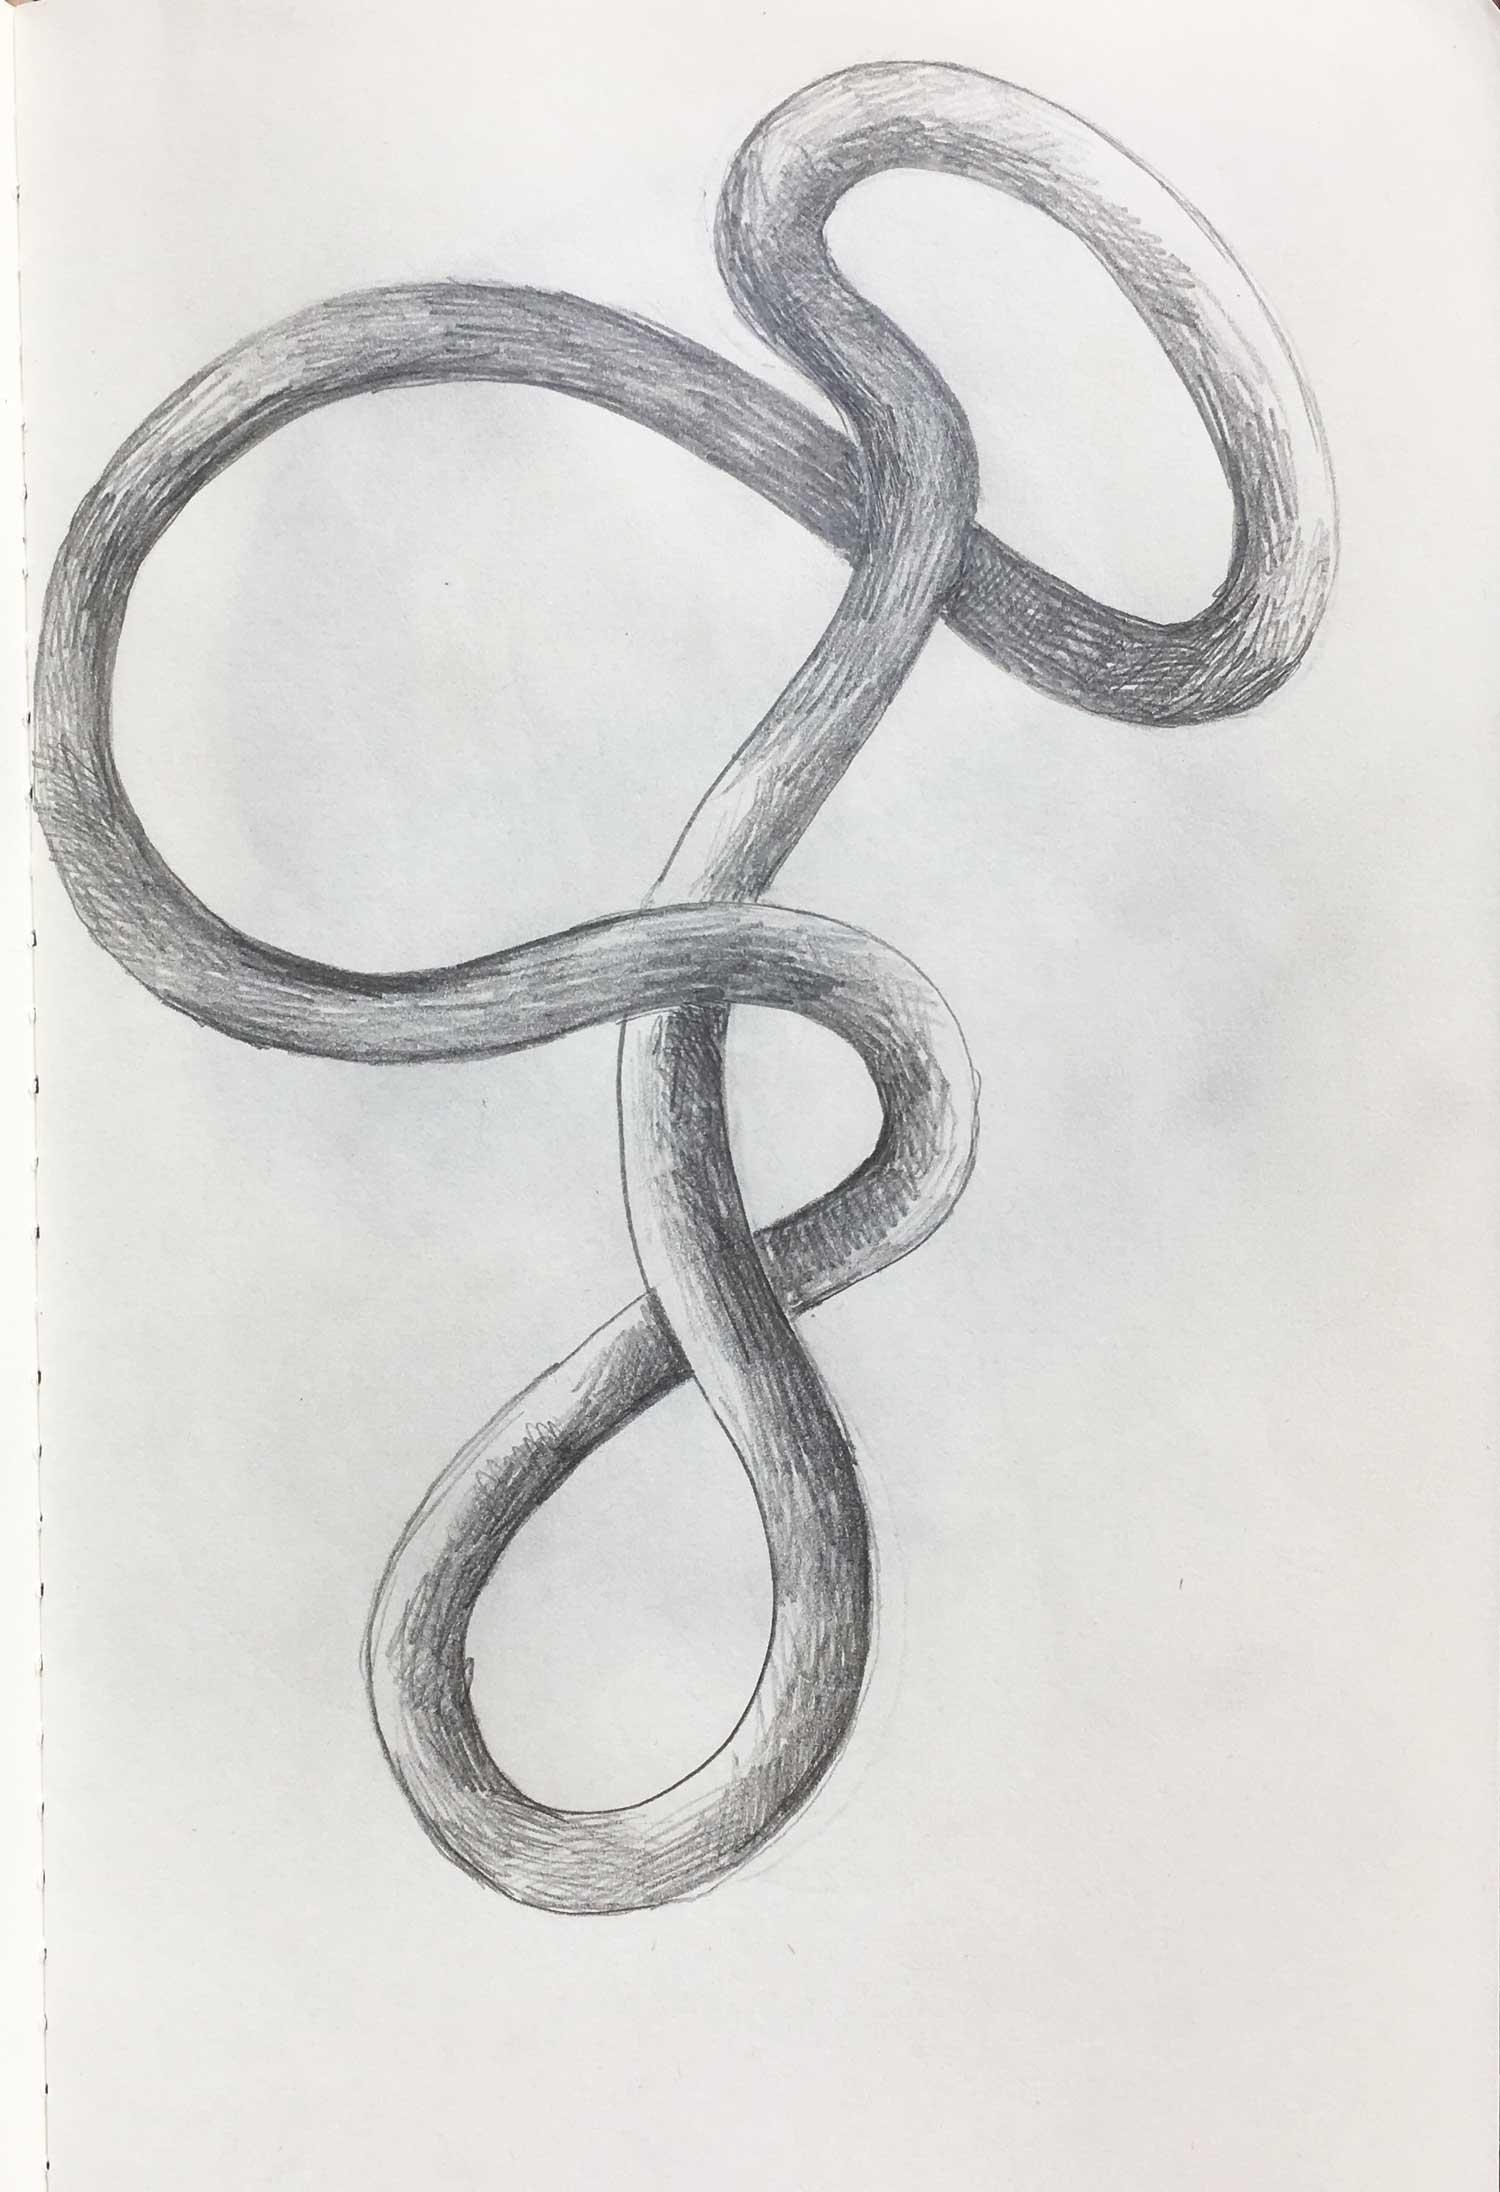 rebecca_bramwell_drawing_feb.jpg